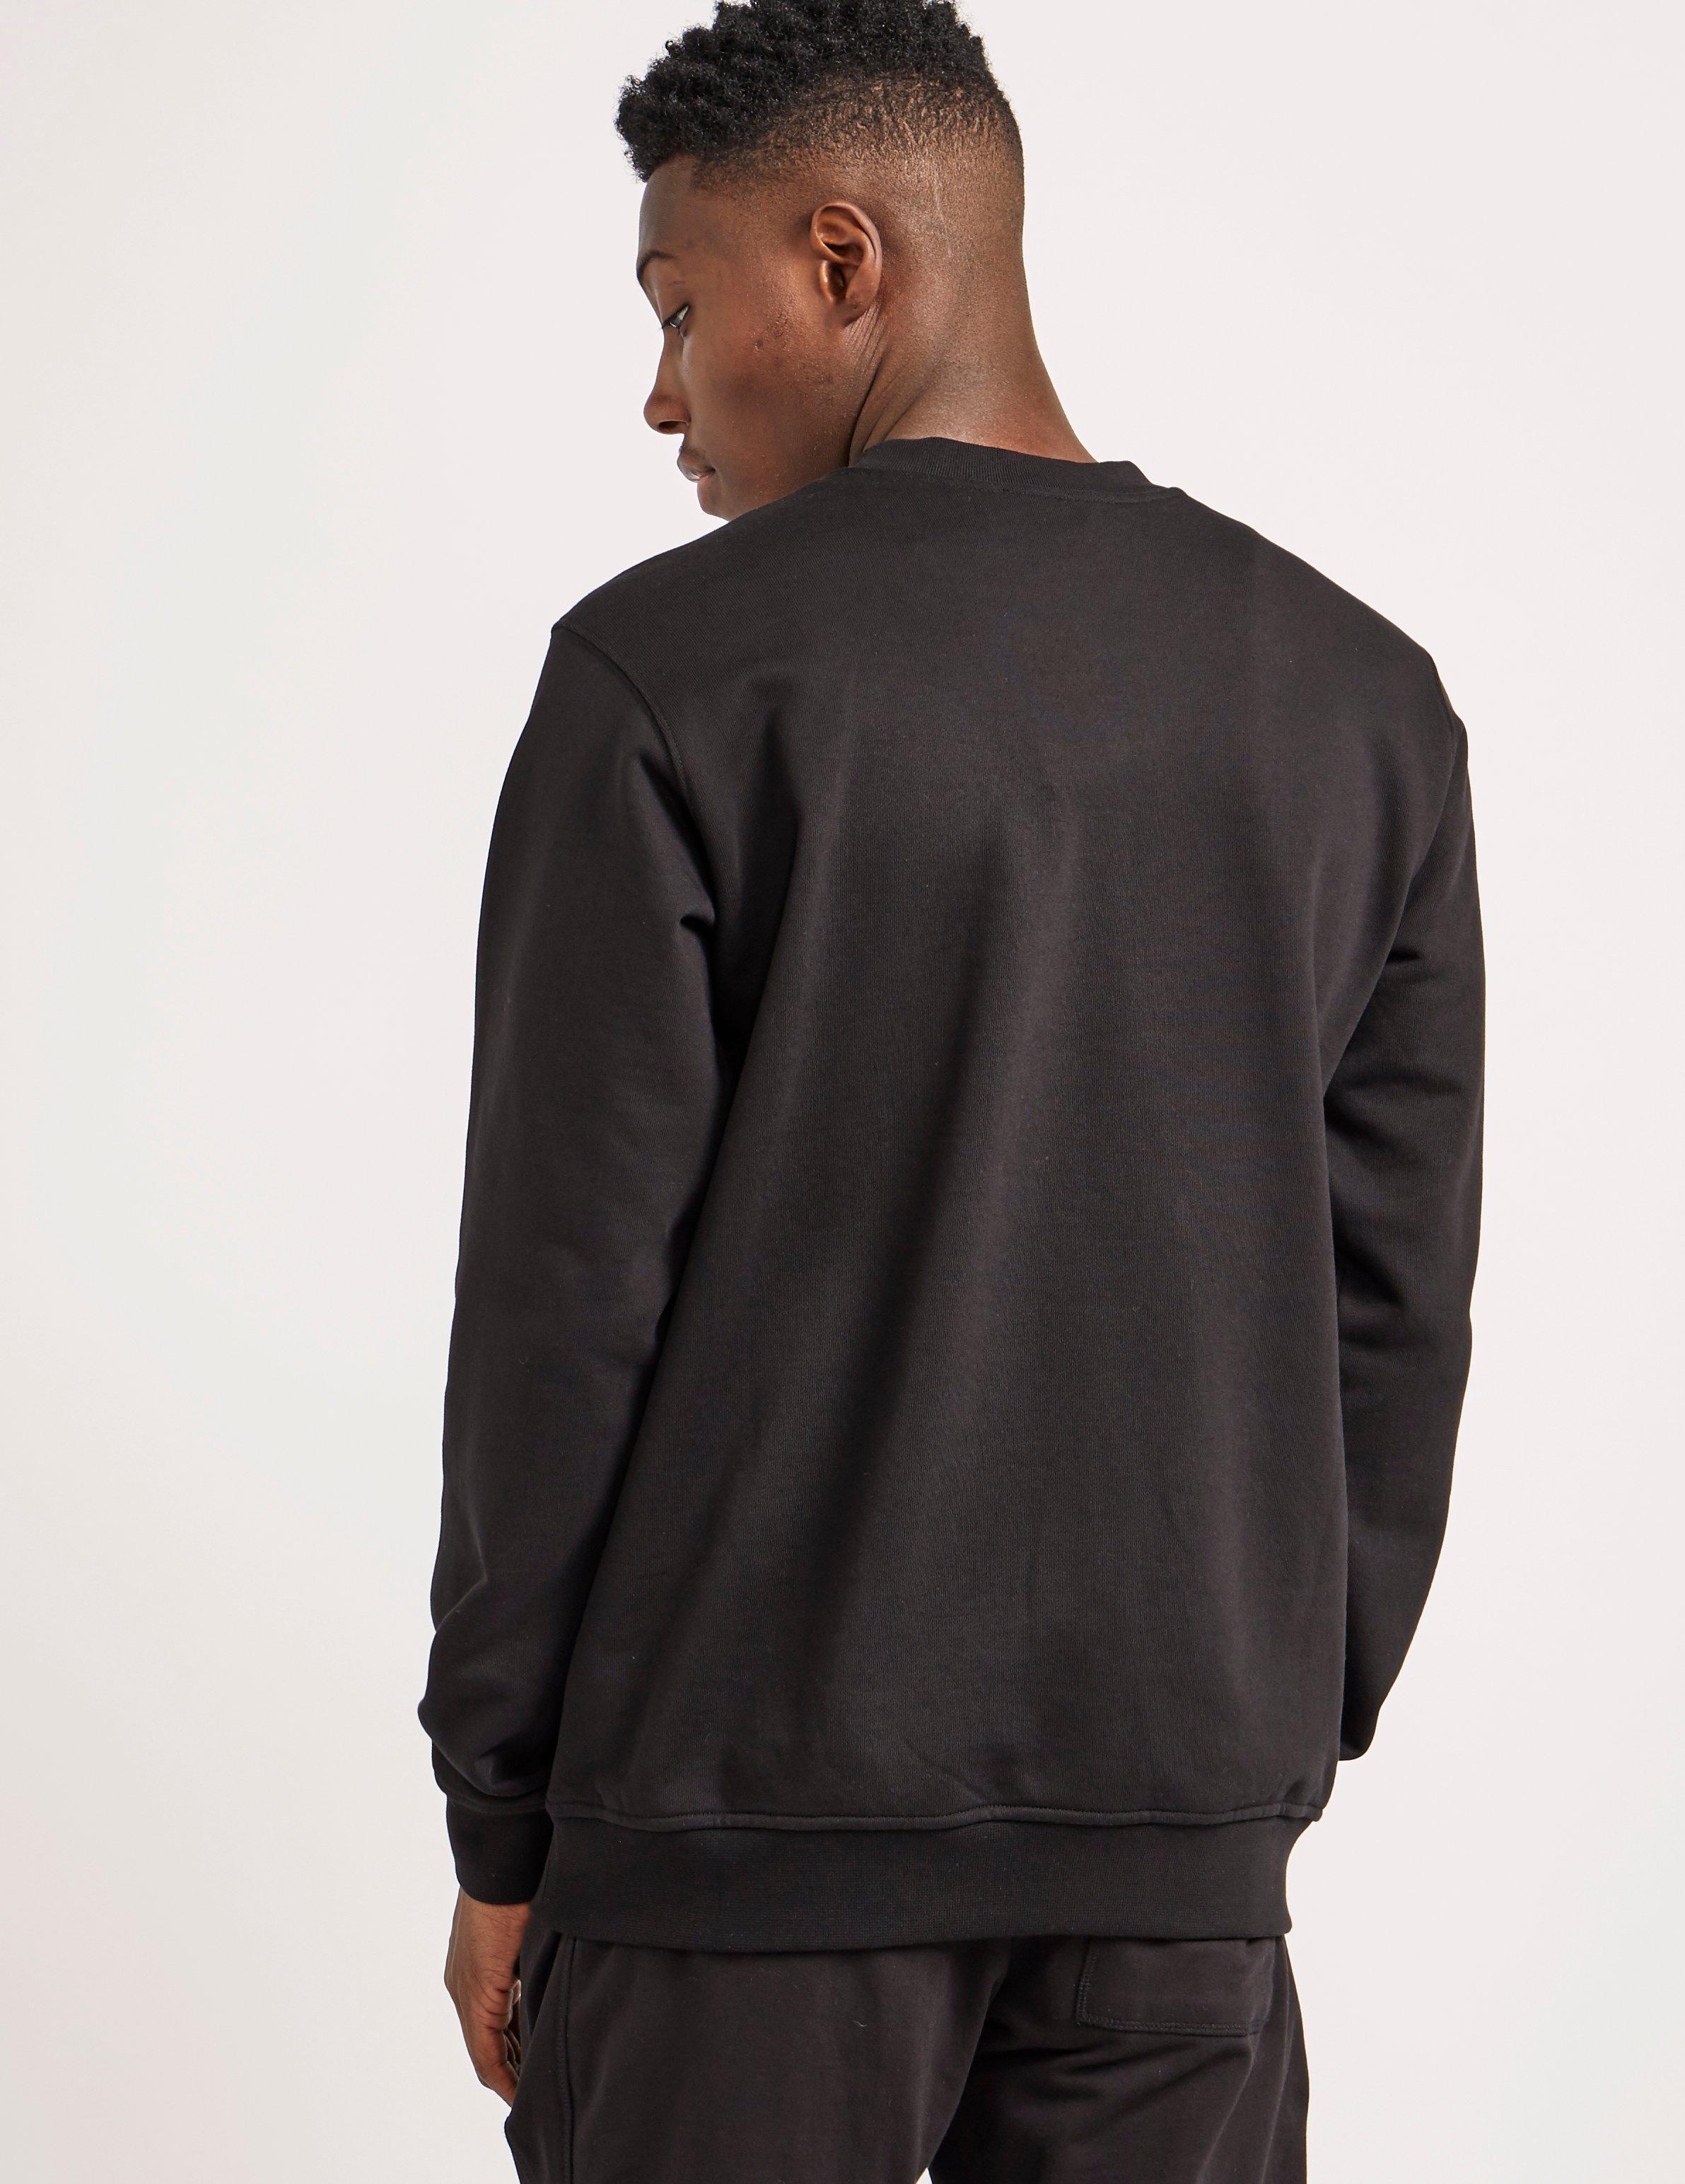 Love Moschino Peace Sweatshirt in Black for Men